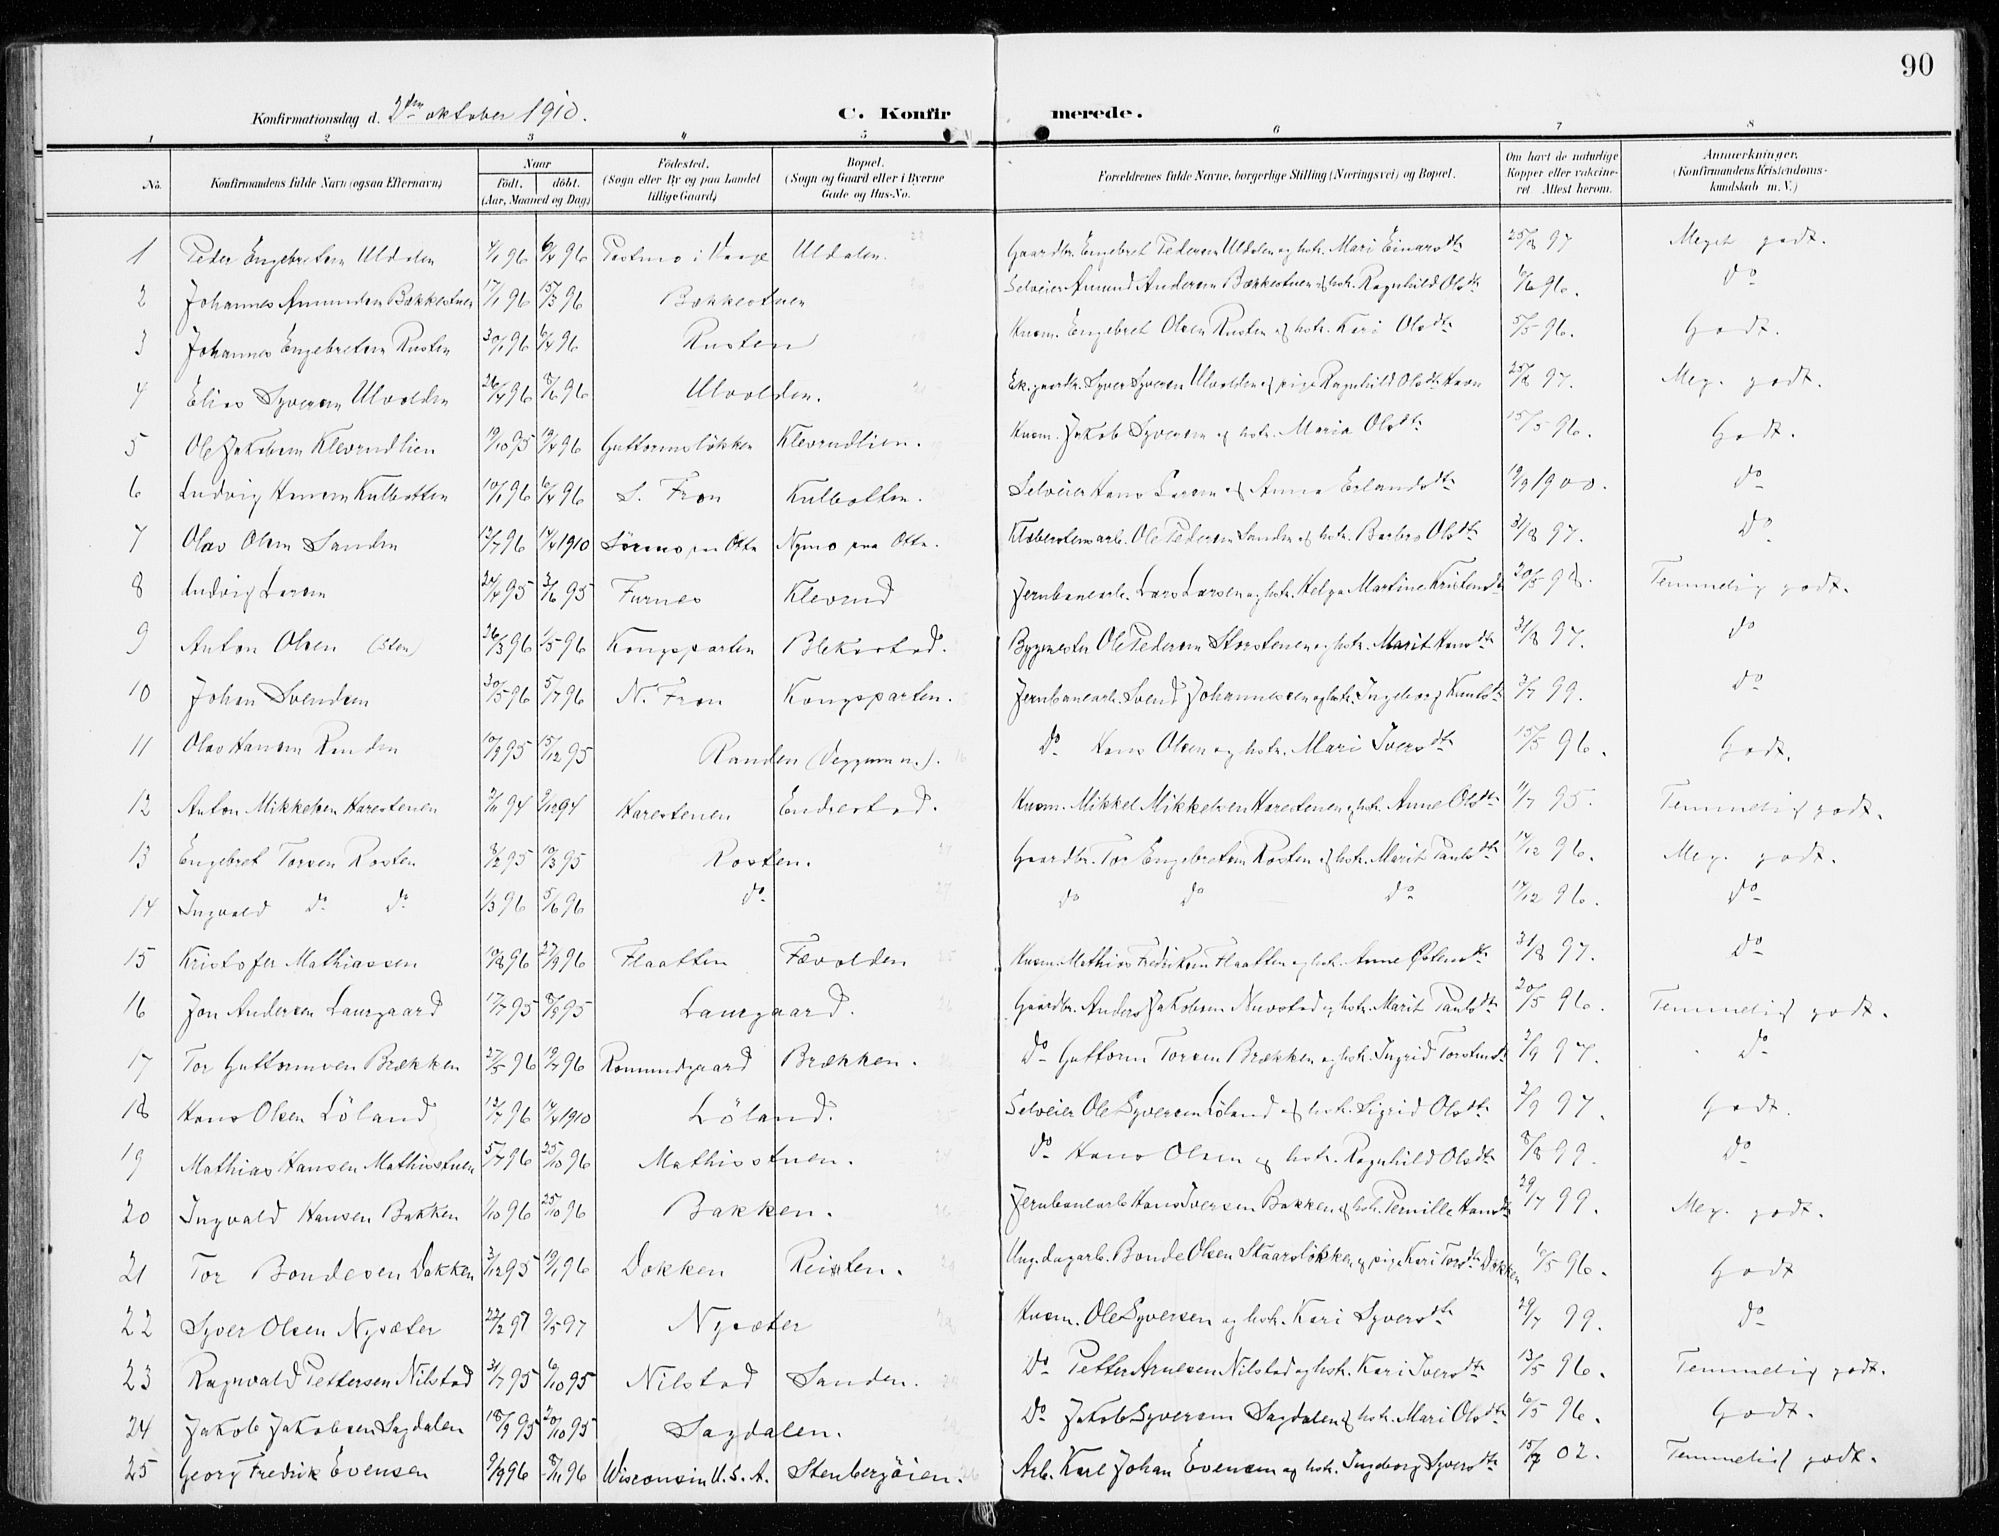 SAH, Sel prestekontor, Ministerialbok nr. 2, 1905-1919, s. 90